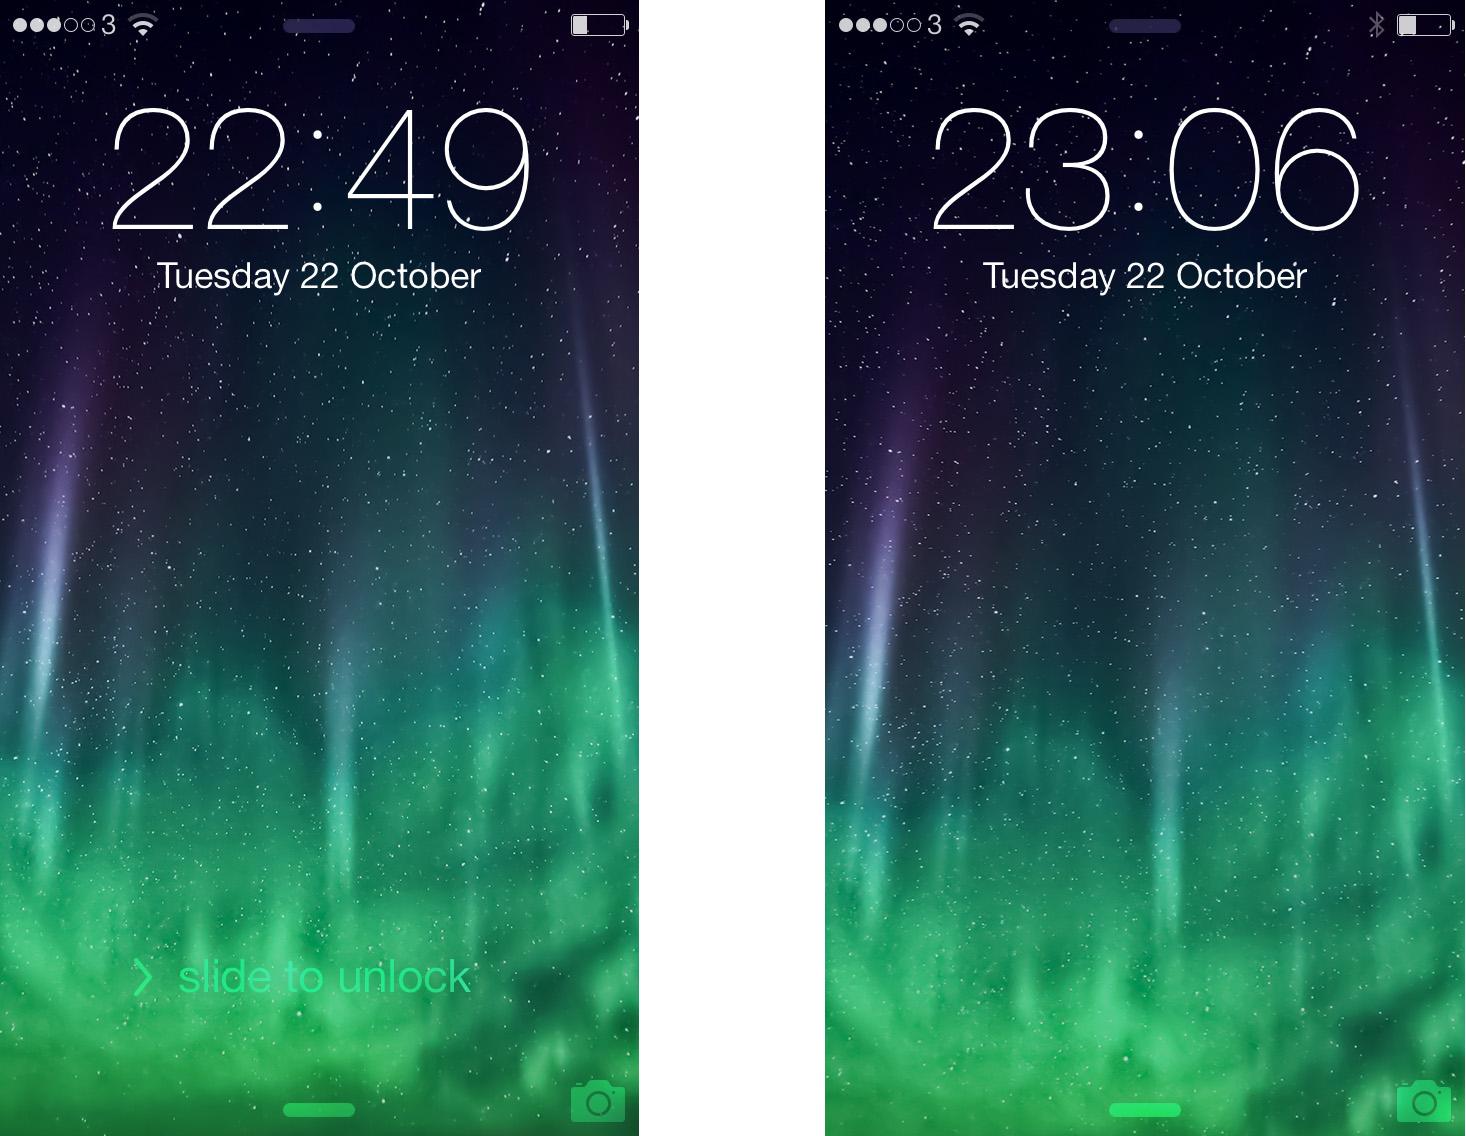 Slide to unlock updated iPhone 5s iOS 7.0.3 copy